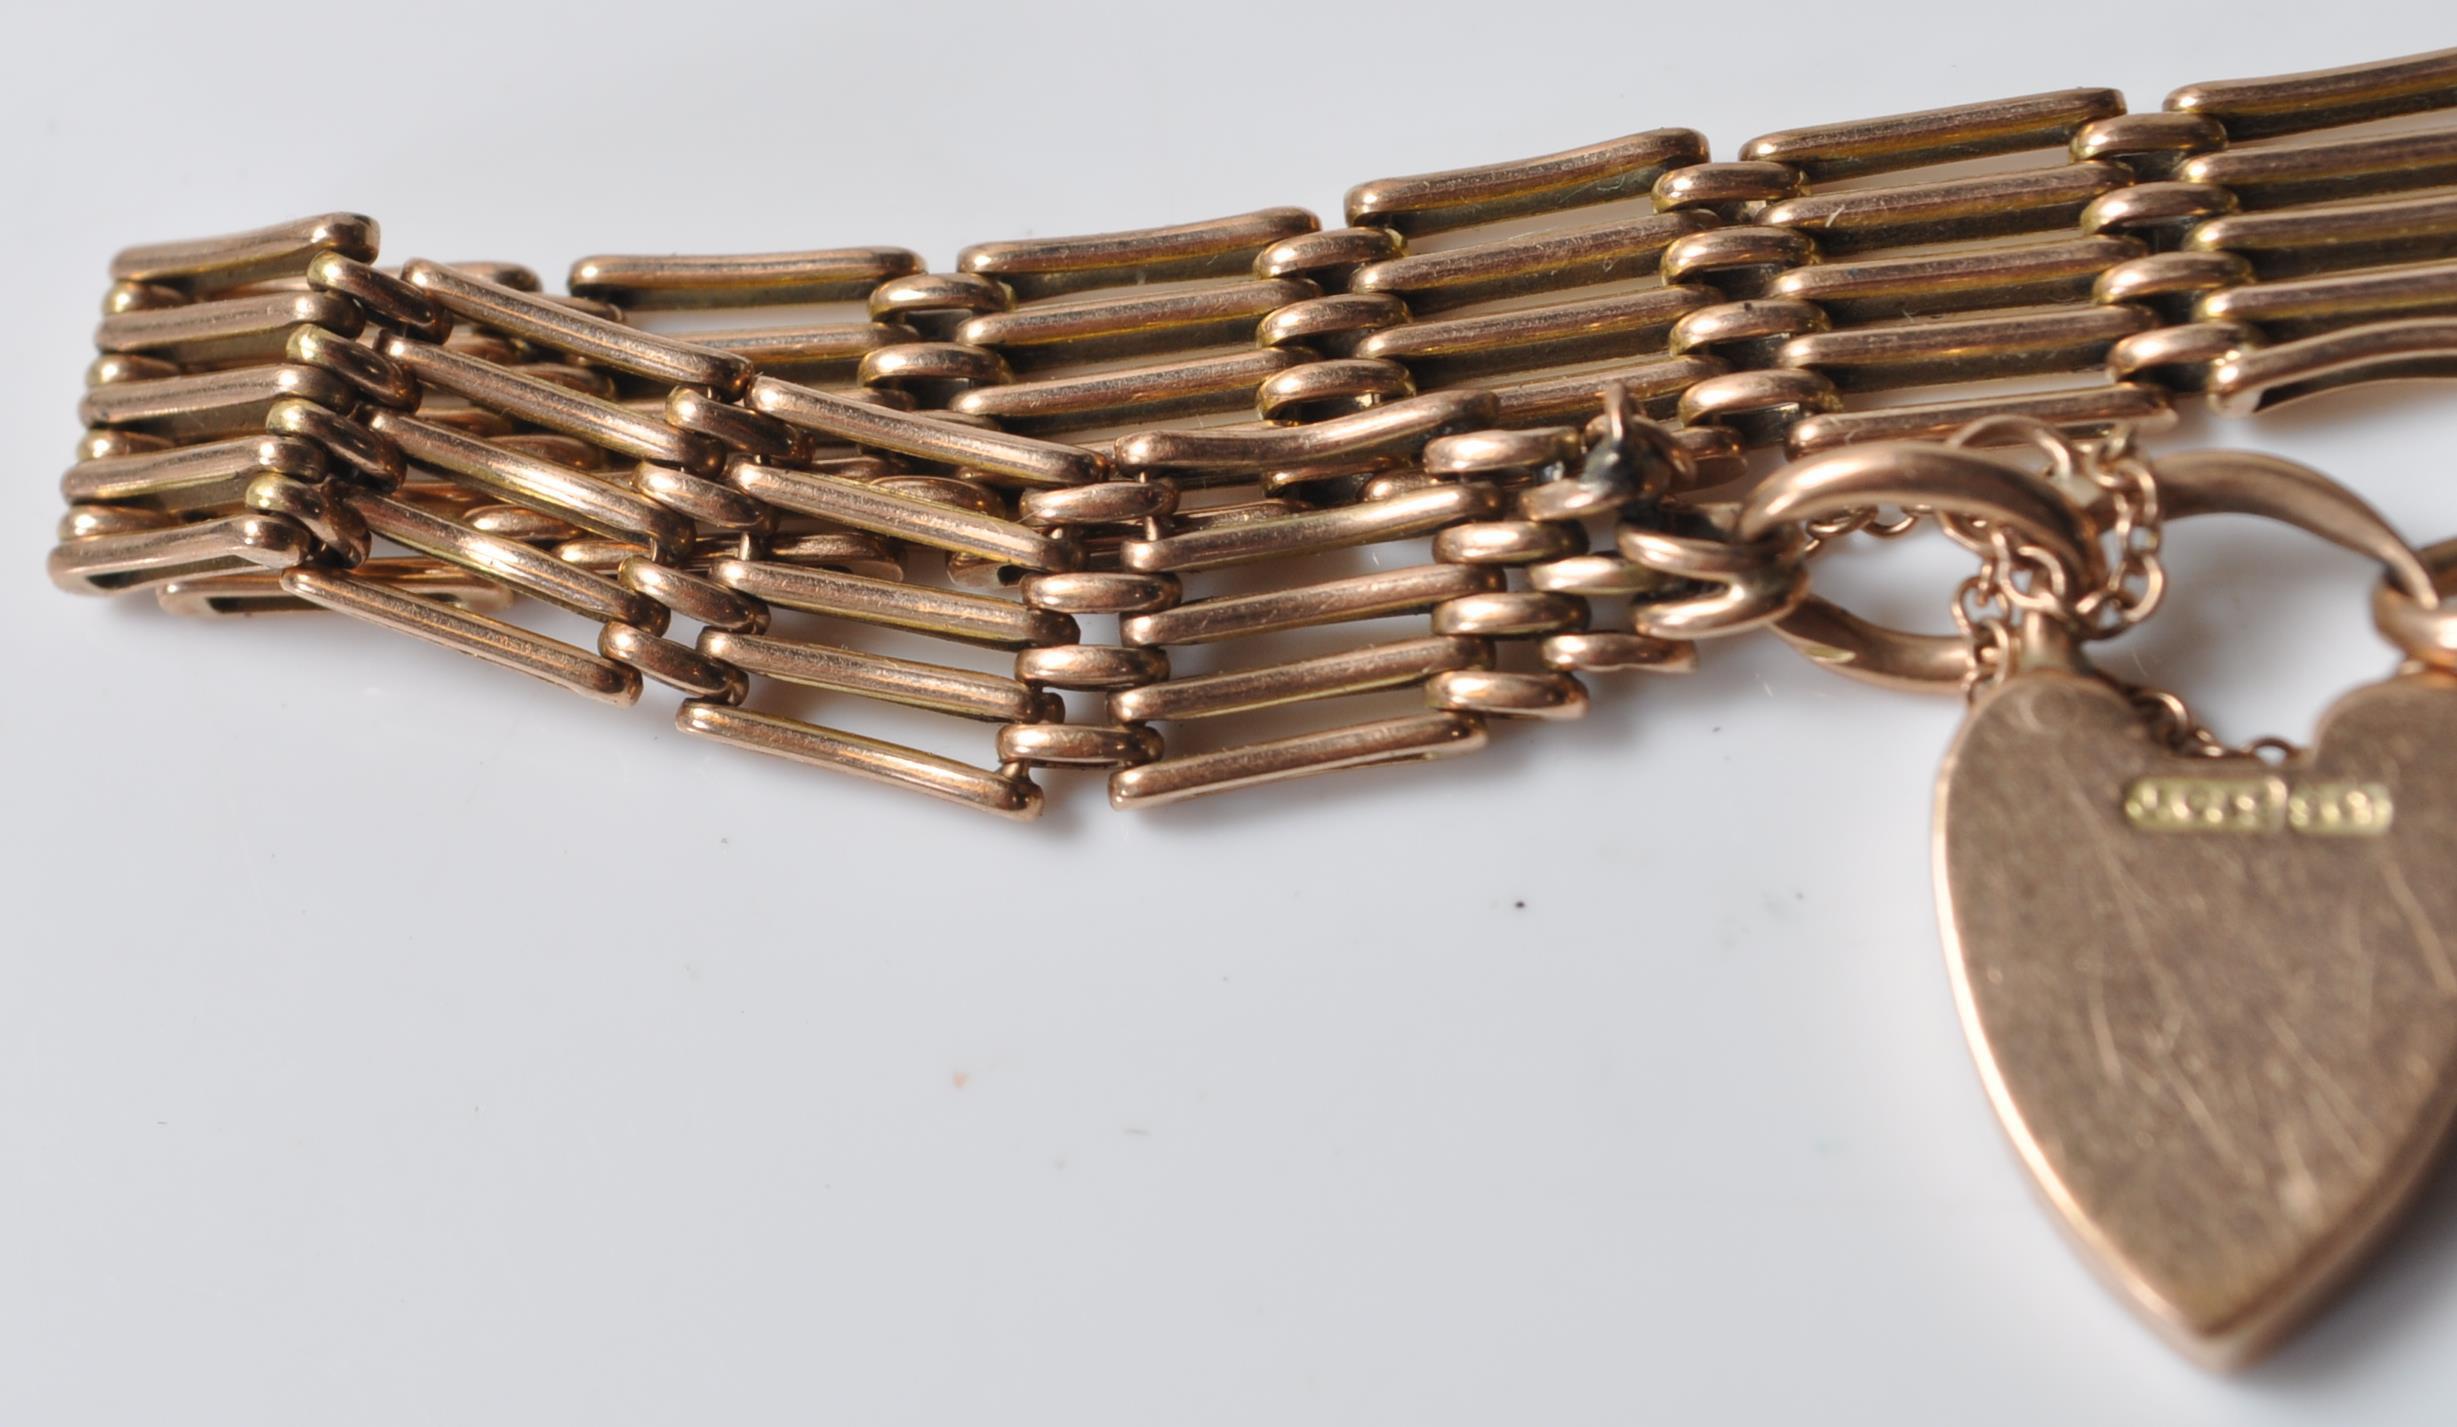 9CT GOLD GATELINK BRACELET - Image 4 of 5